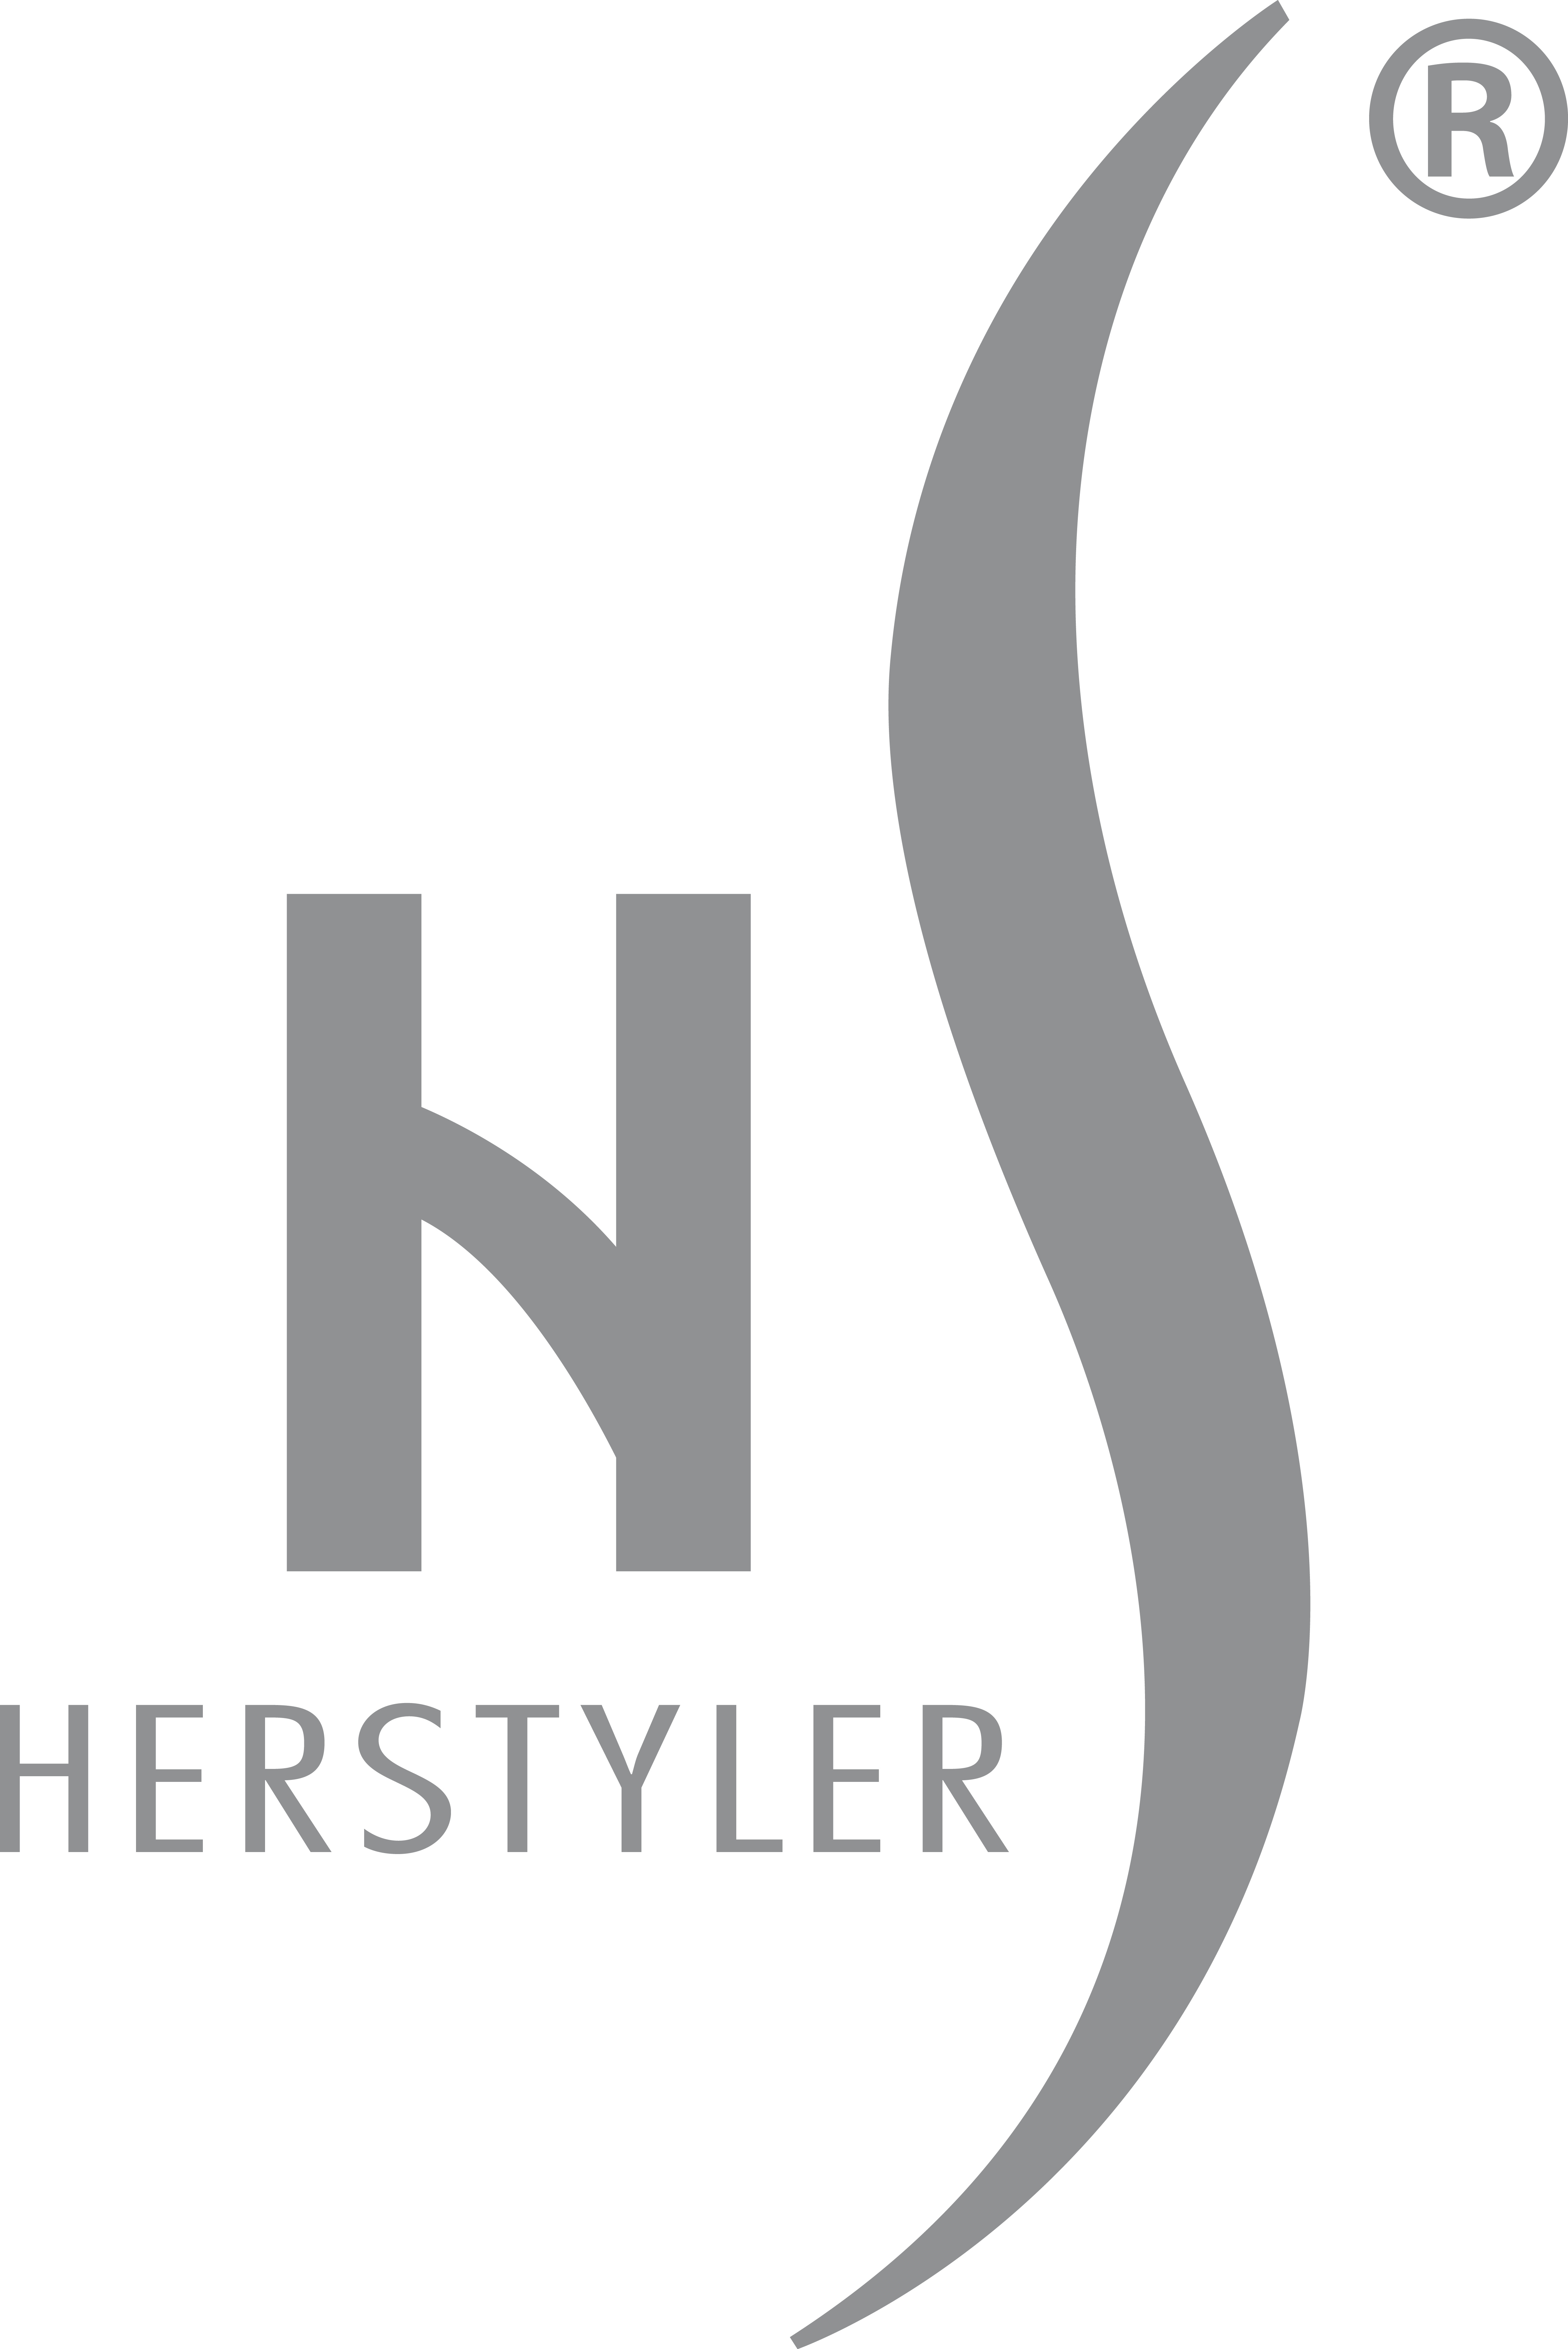 HerStyler